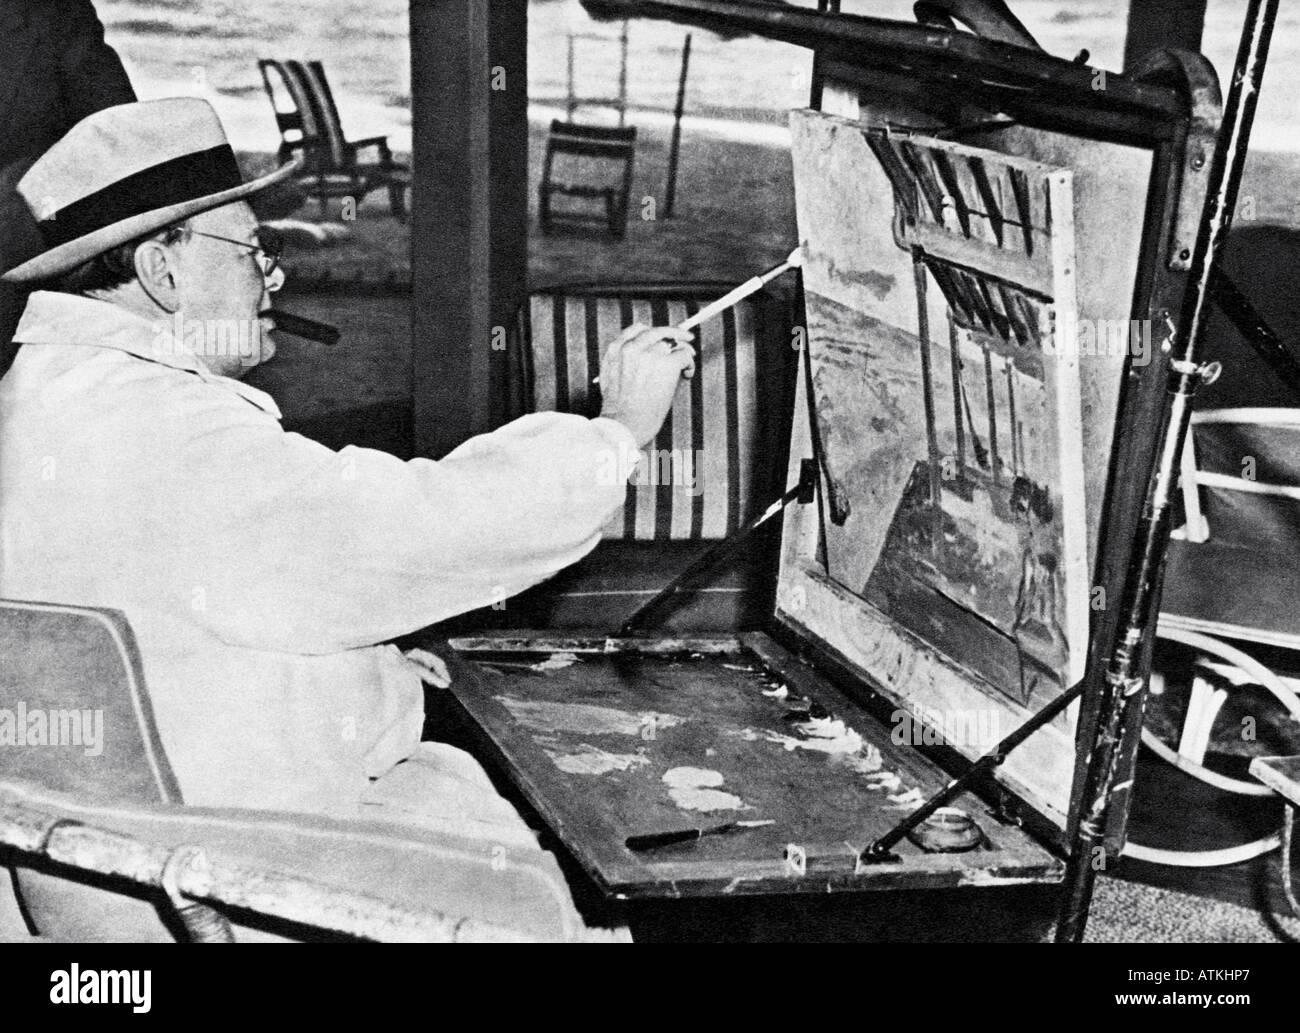 Winston Churchill Schriften Reden Bilder Kulturport De